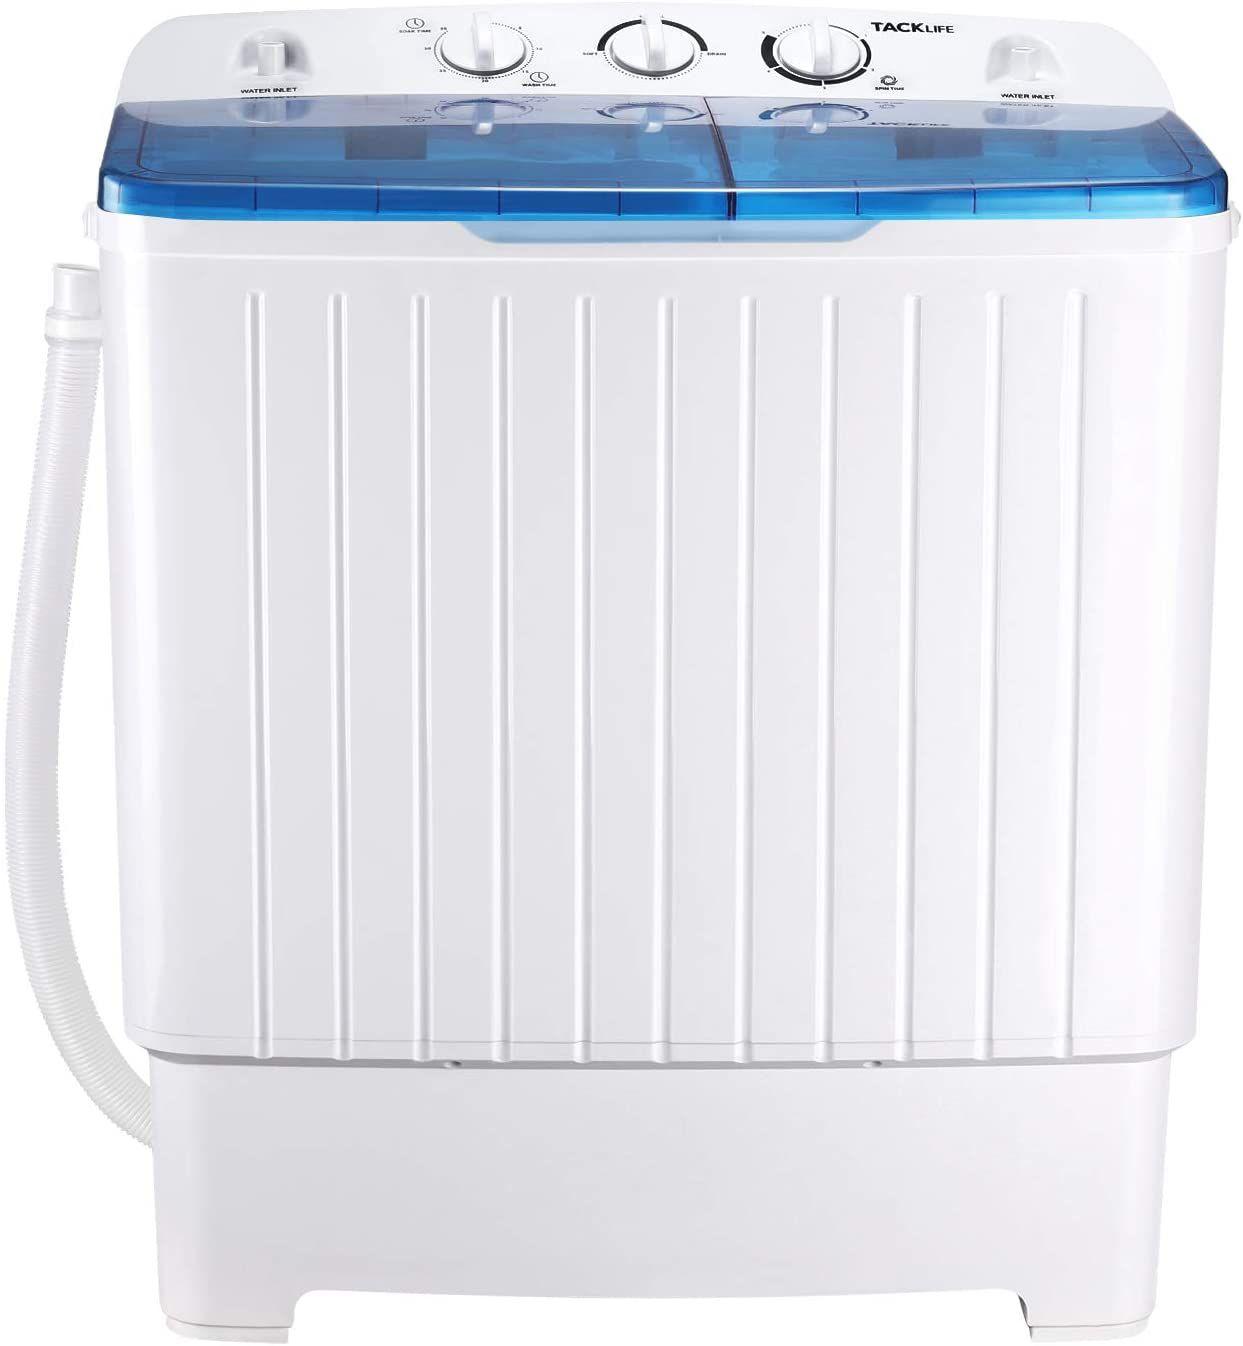 Tacklife 17.6 lbs Mini Compact Twin Tub Washing Machine